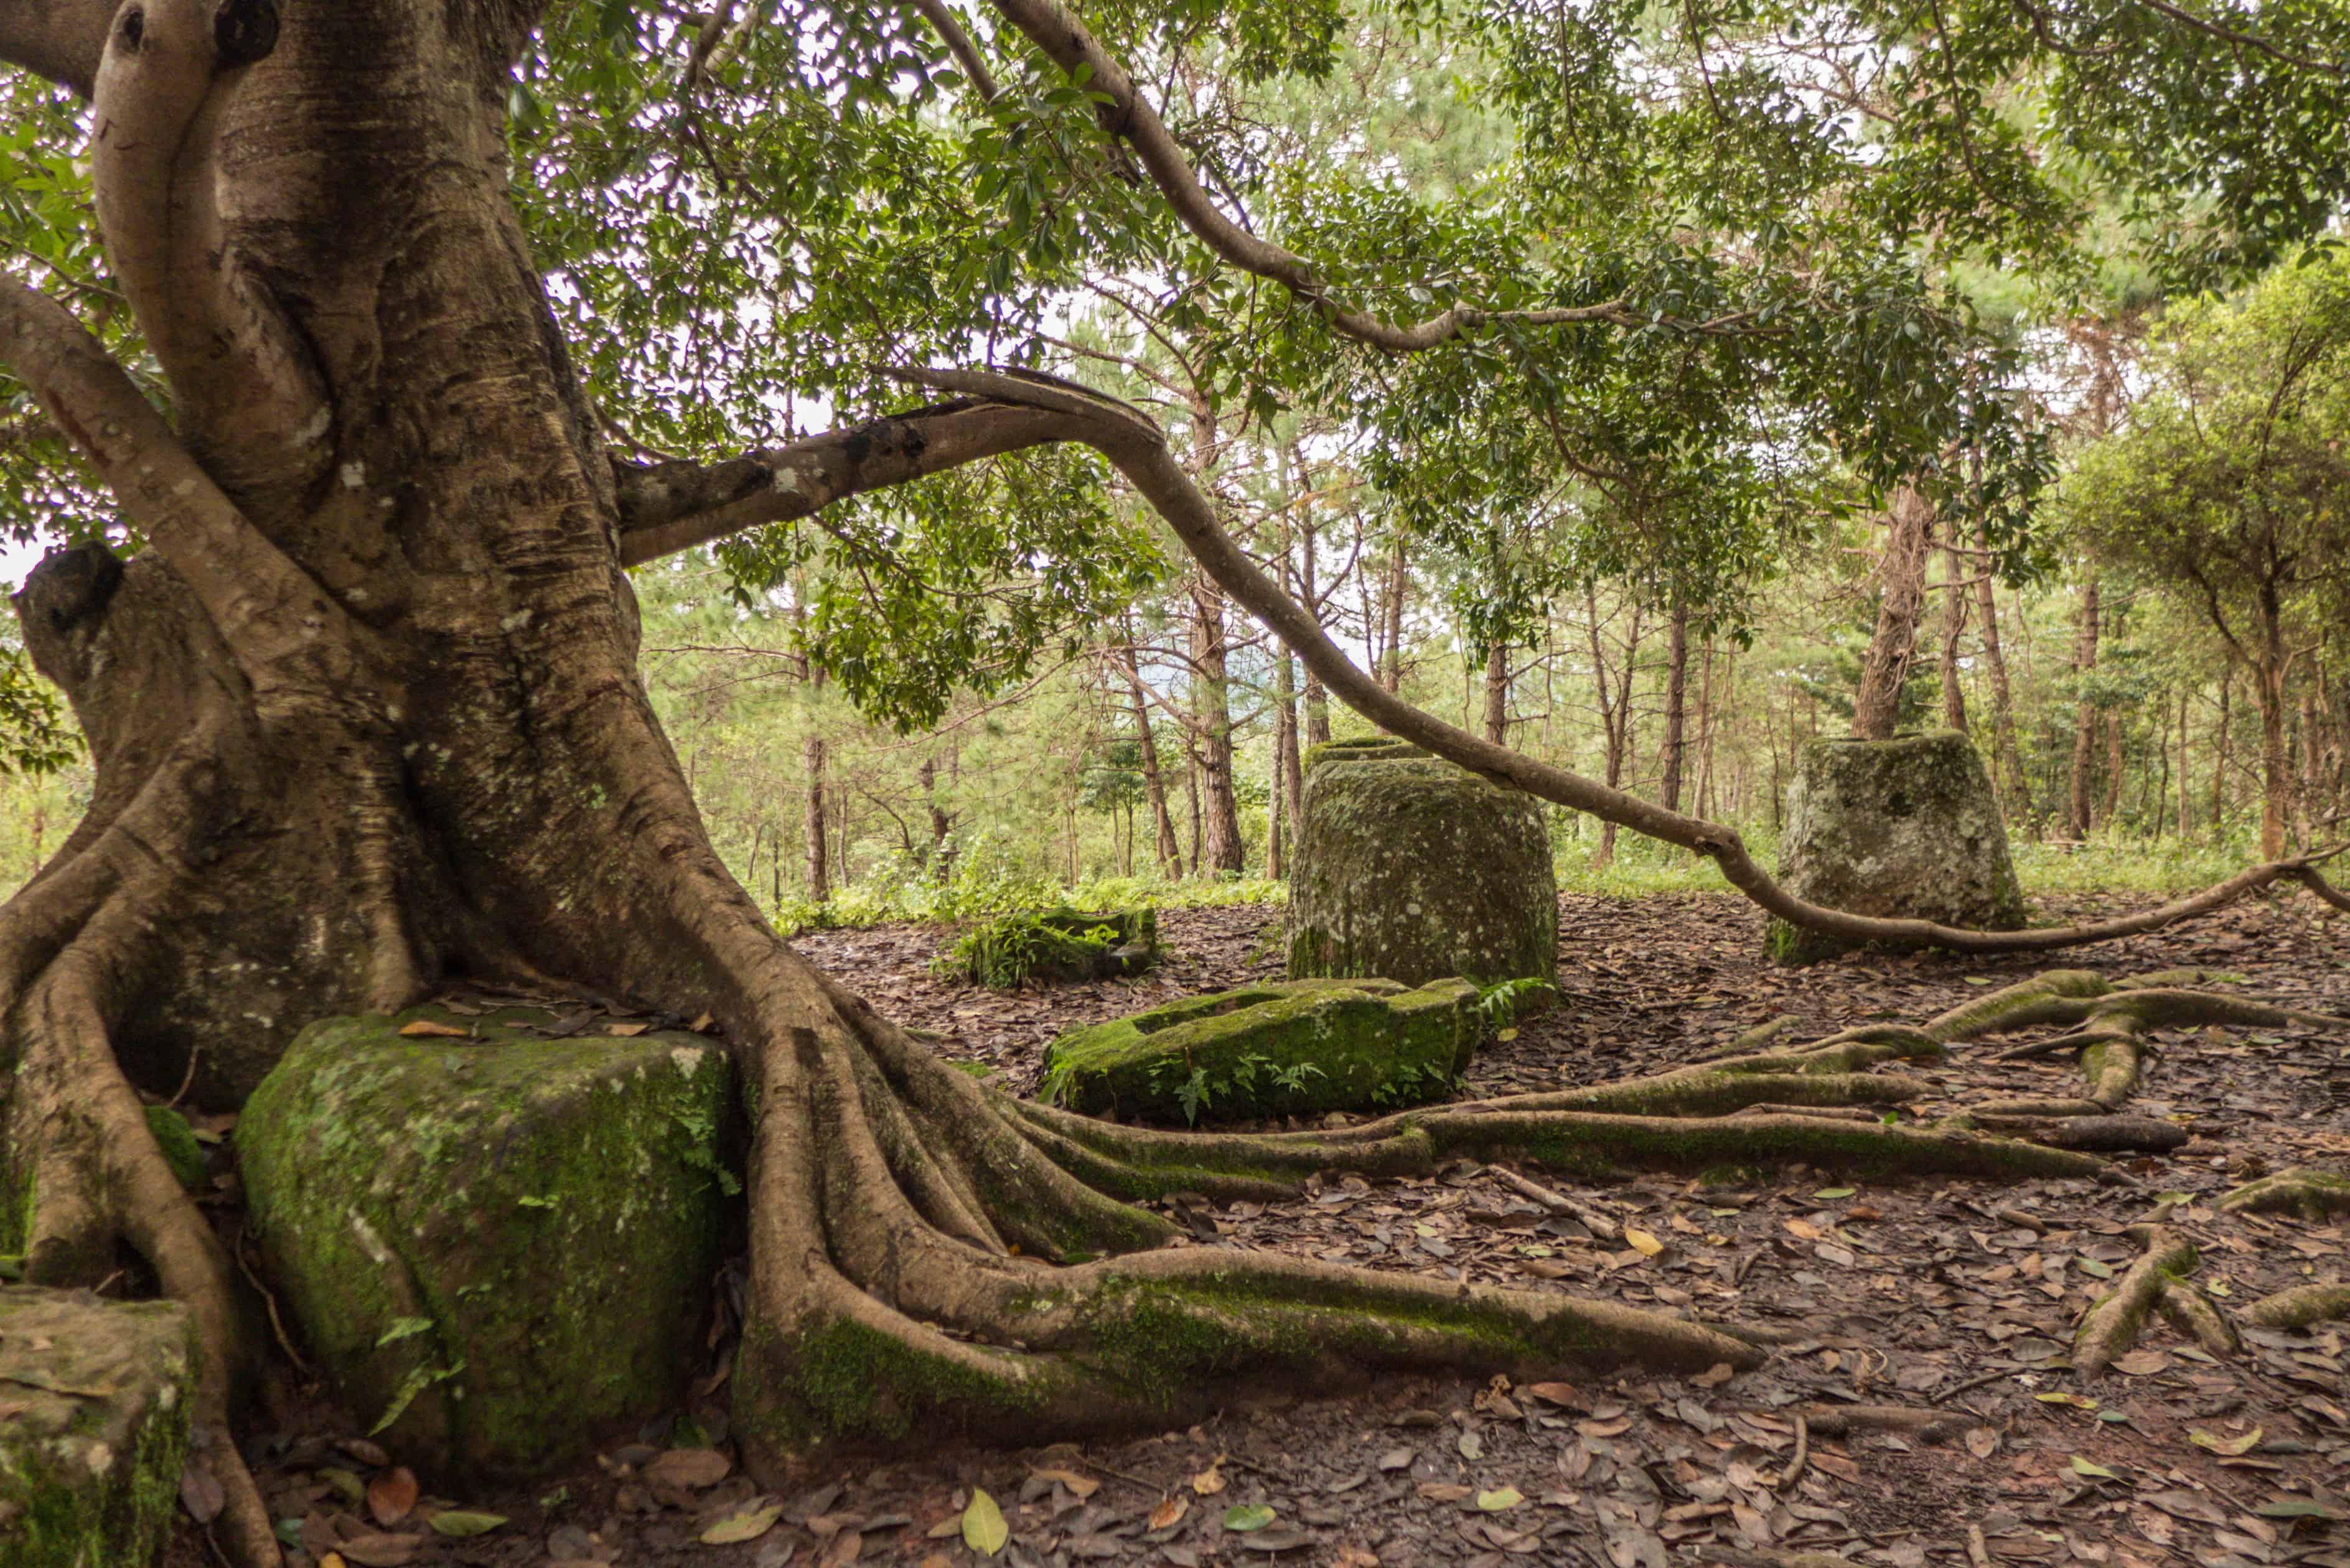 Jar Site 2; Równina dzbanów; Laos